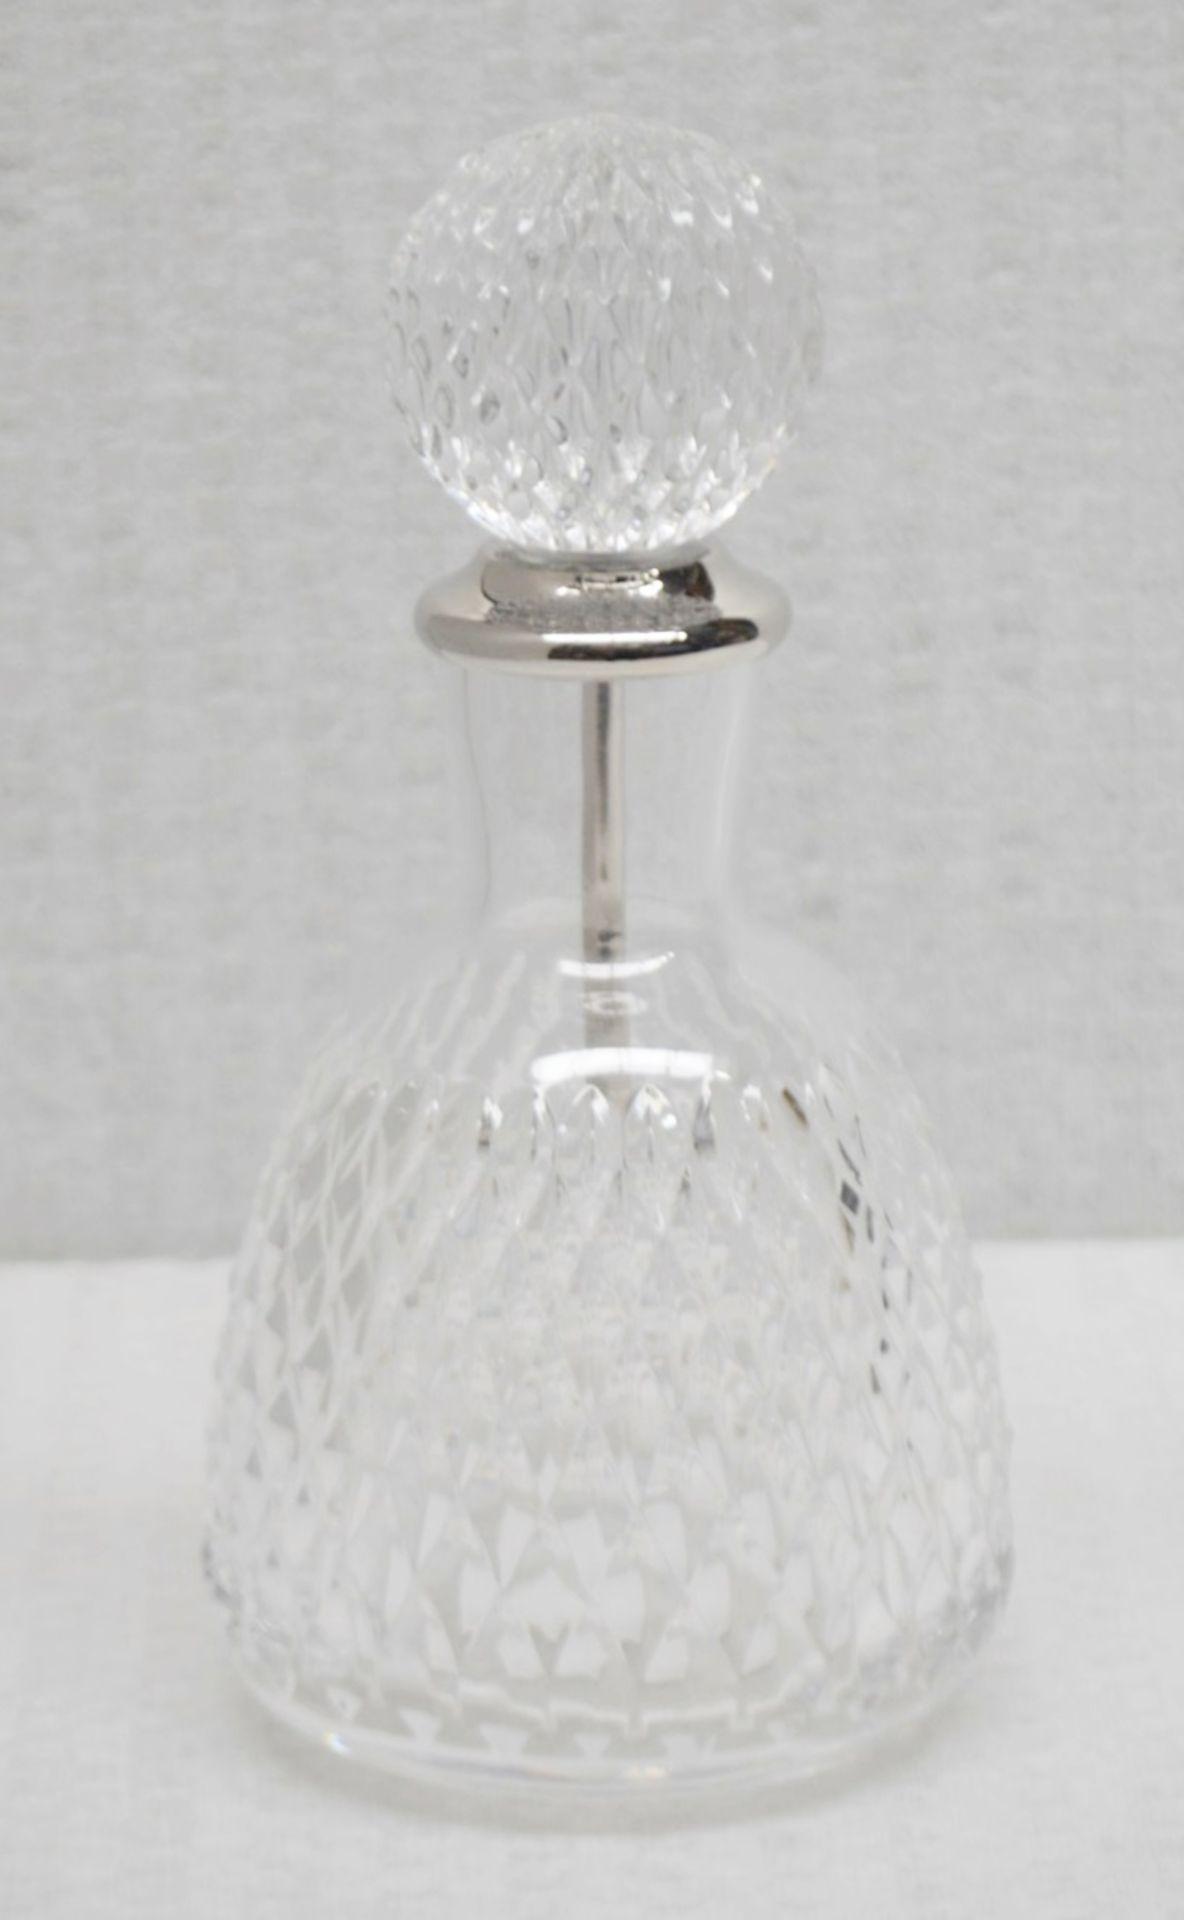 1 x BALDI 'Home Jewels' Italian Hand-crafted Artisan Clear Diamond Crystal Perfume Bottle &